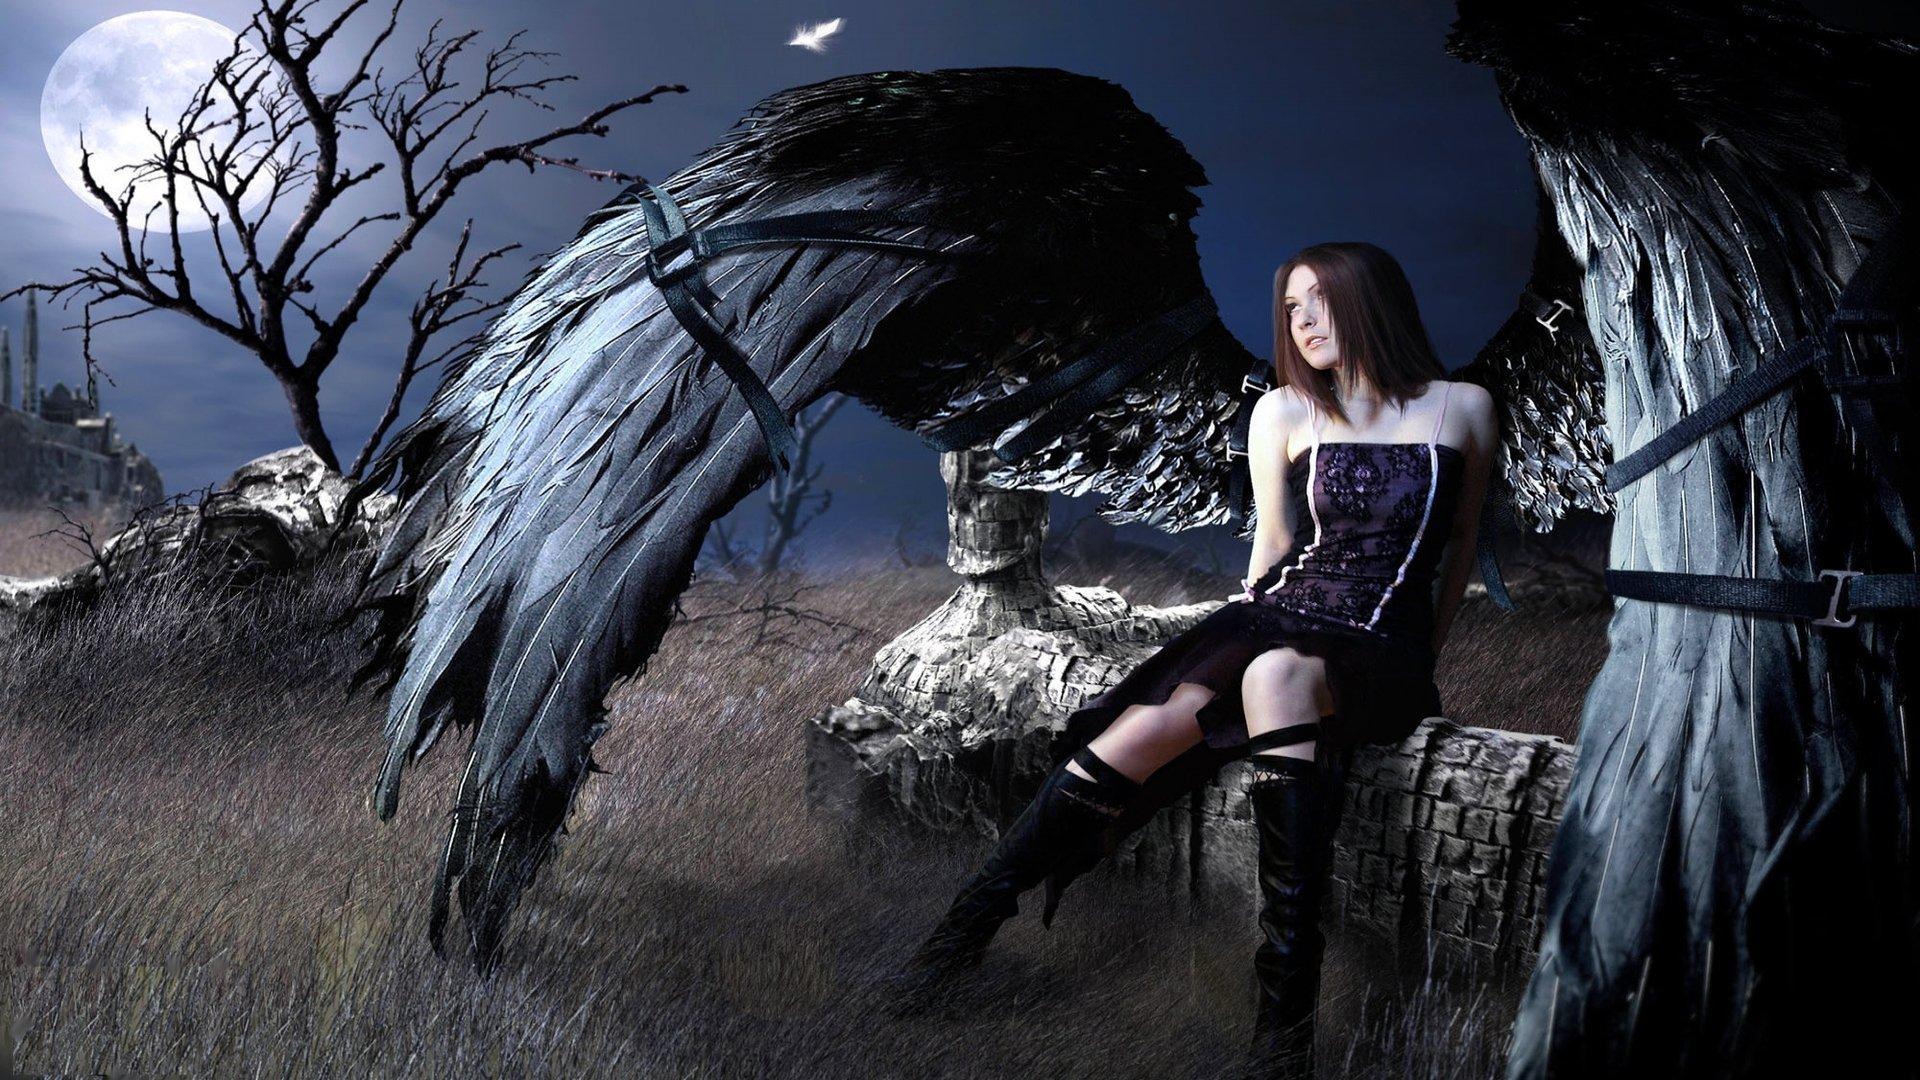 BLACK ANGEL   fantasy dark girl wallpaper background 1920x1080